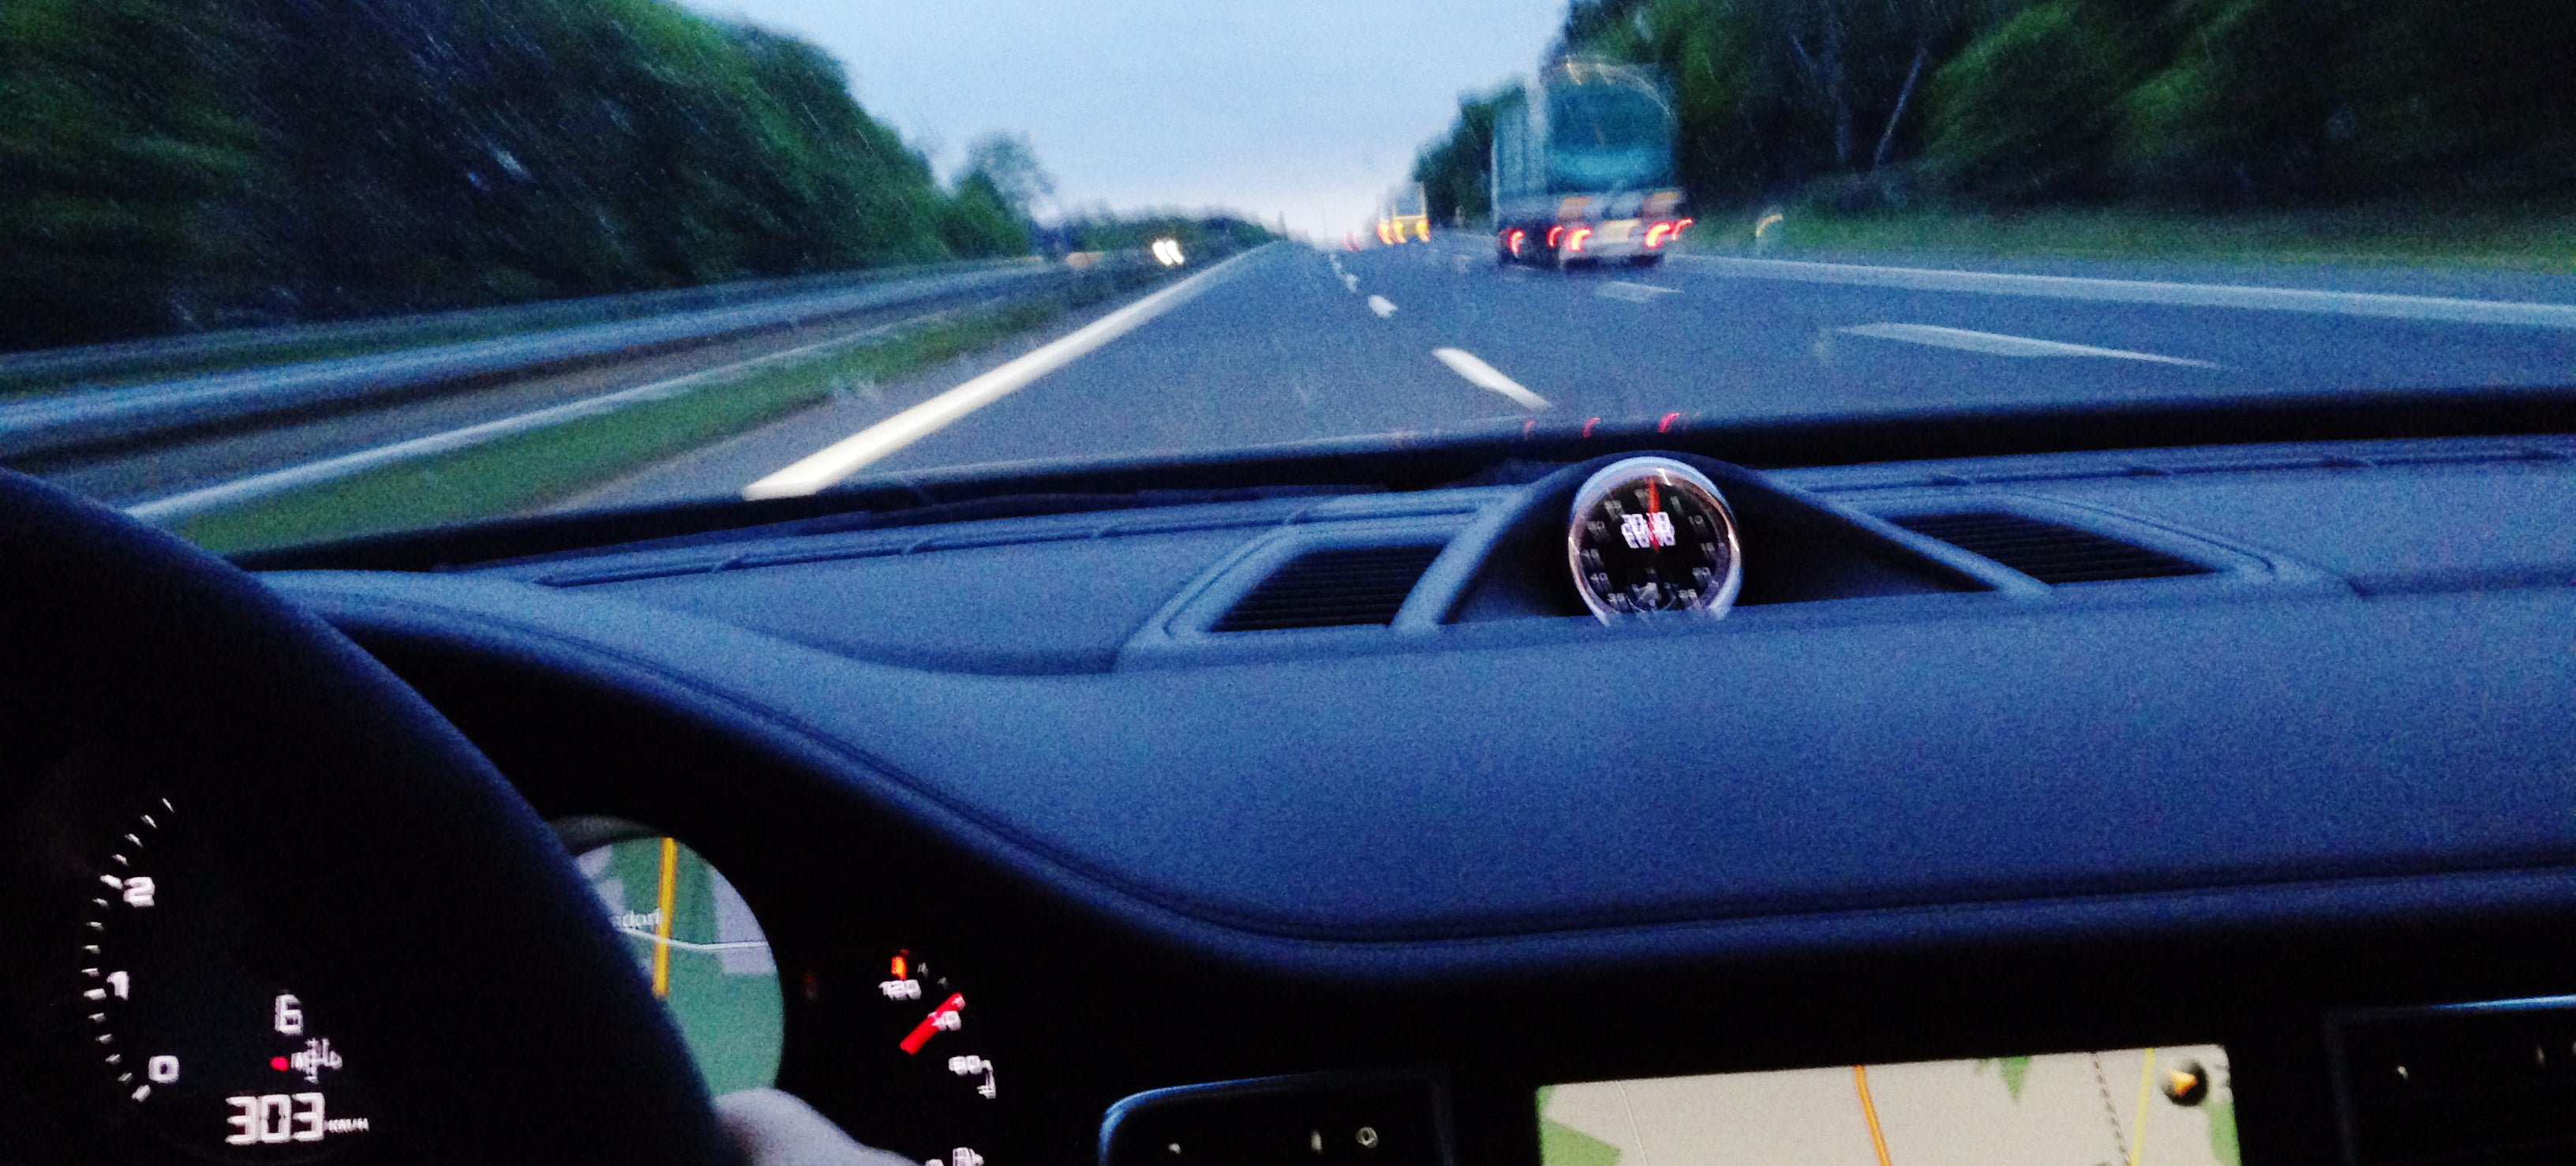 How I Found Myself In A Porsche Panamera Doing 188